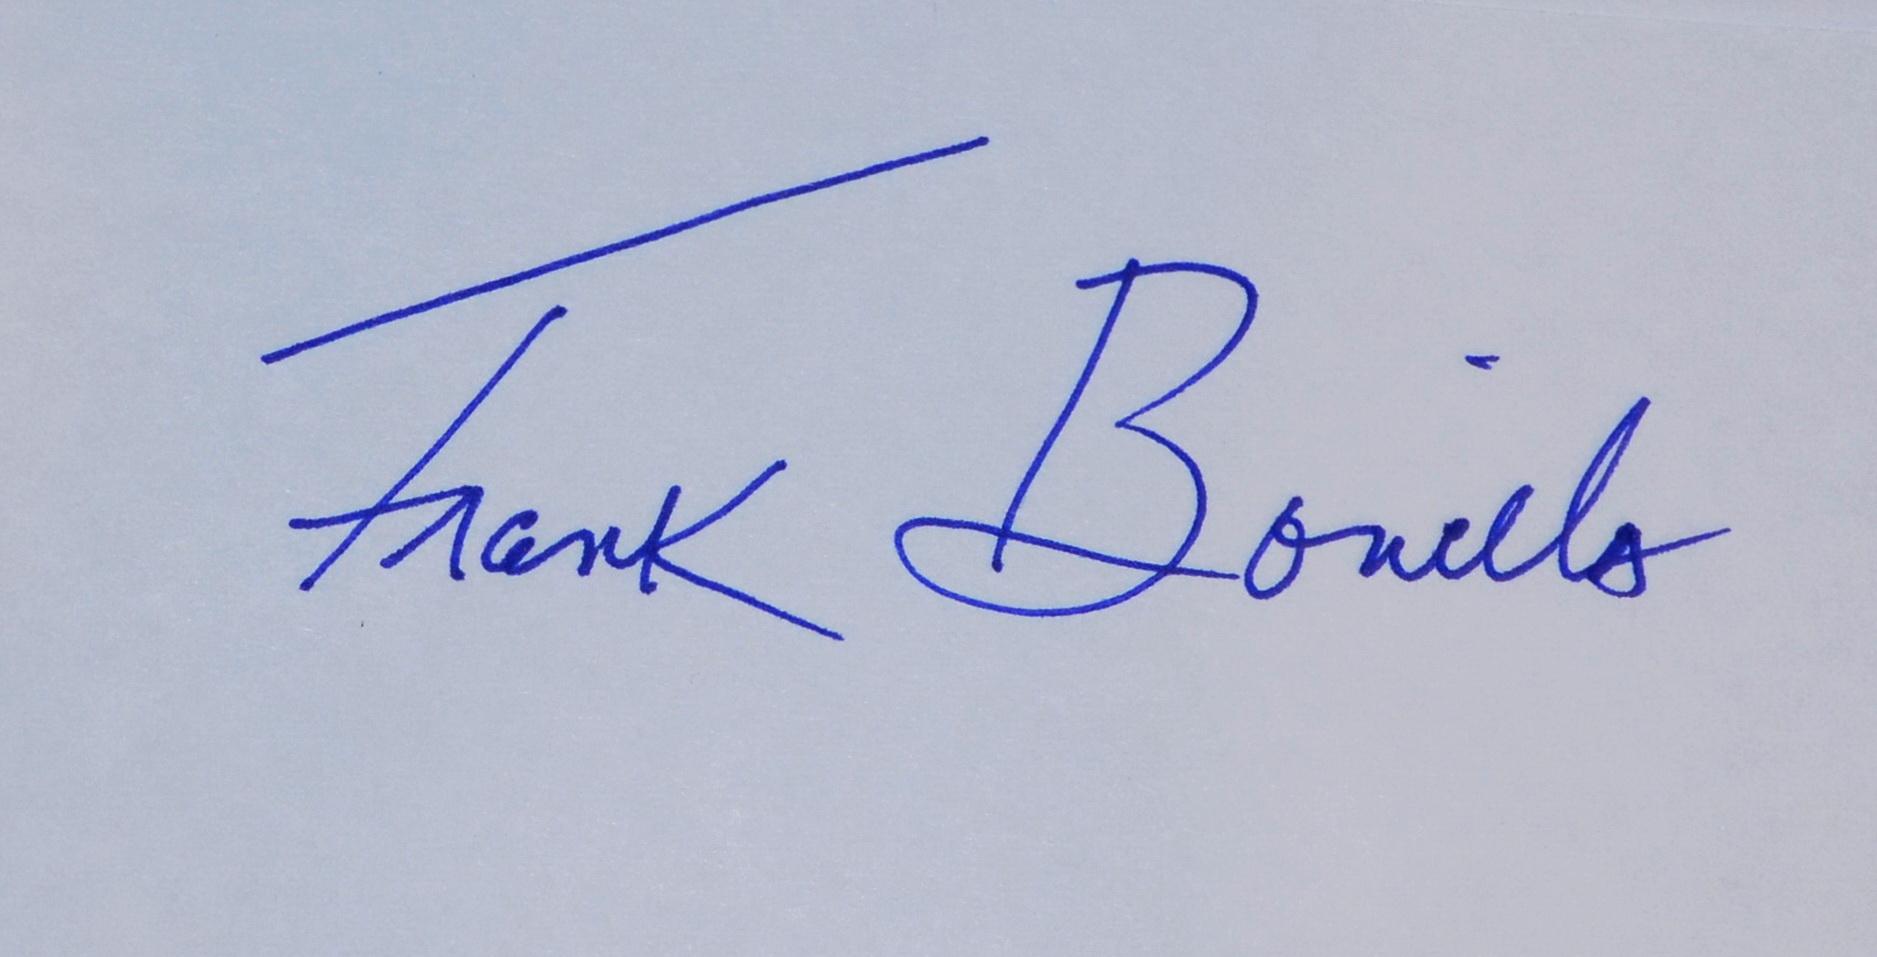 Visual Artist Frank Bonilla's Signature